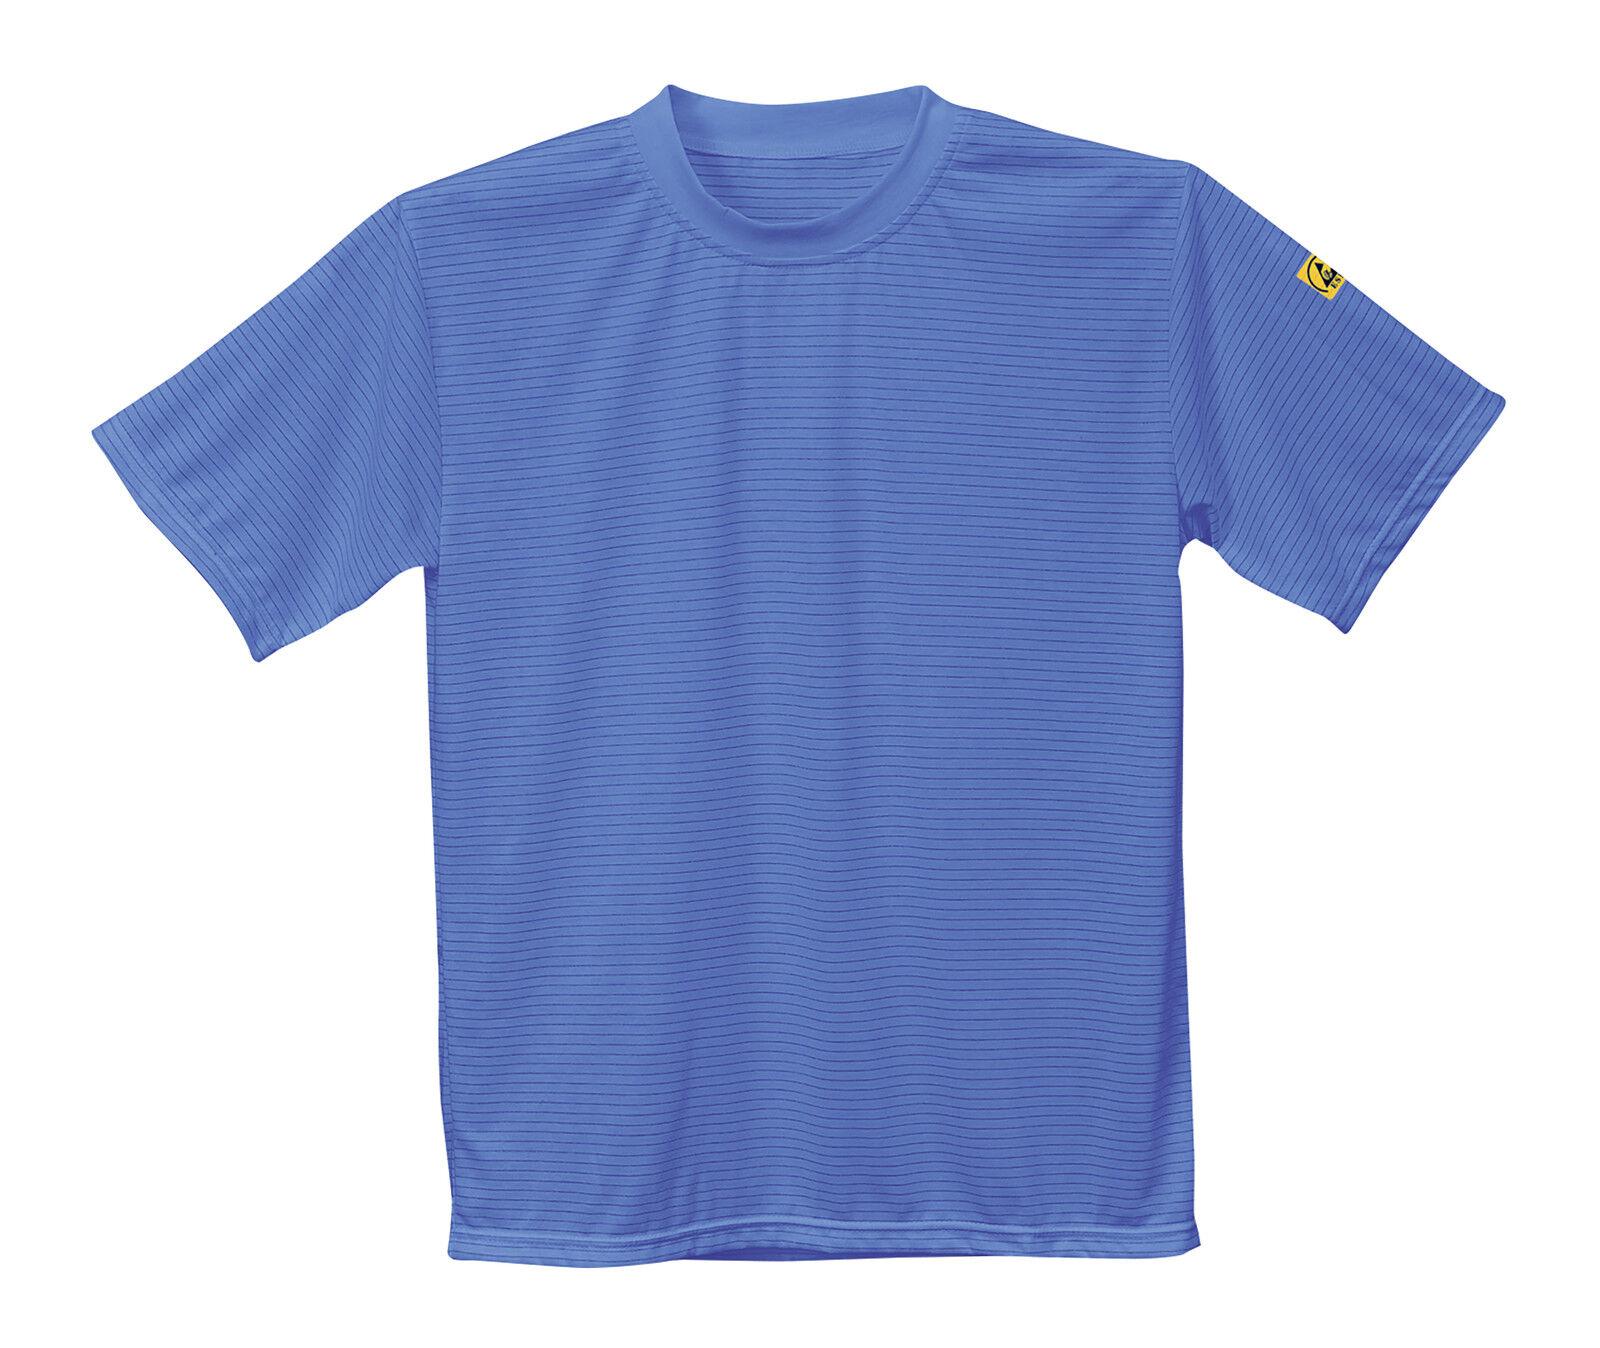 B195 BNWT Free Delivery Portwest Turin Premium T-Shirt